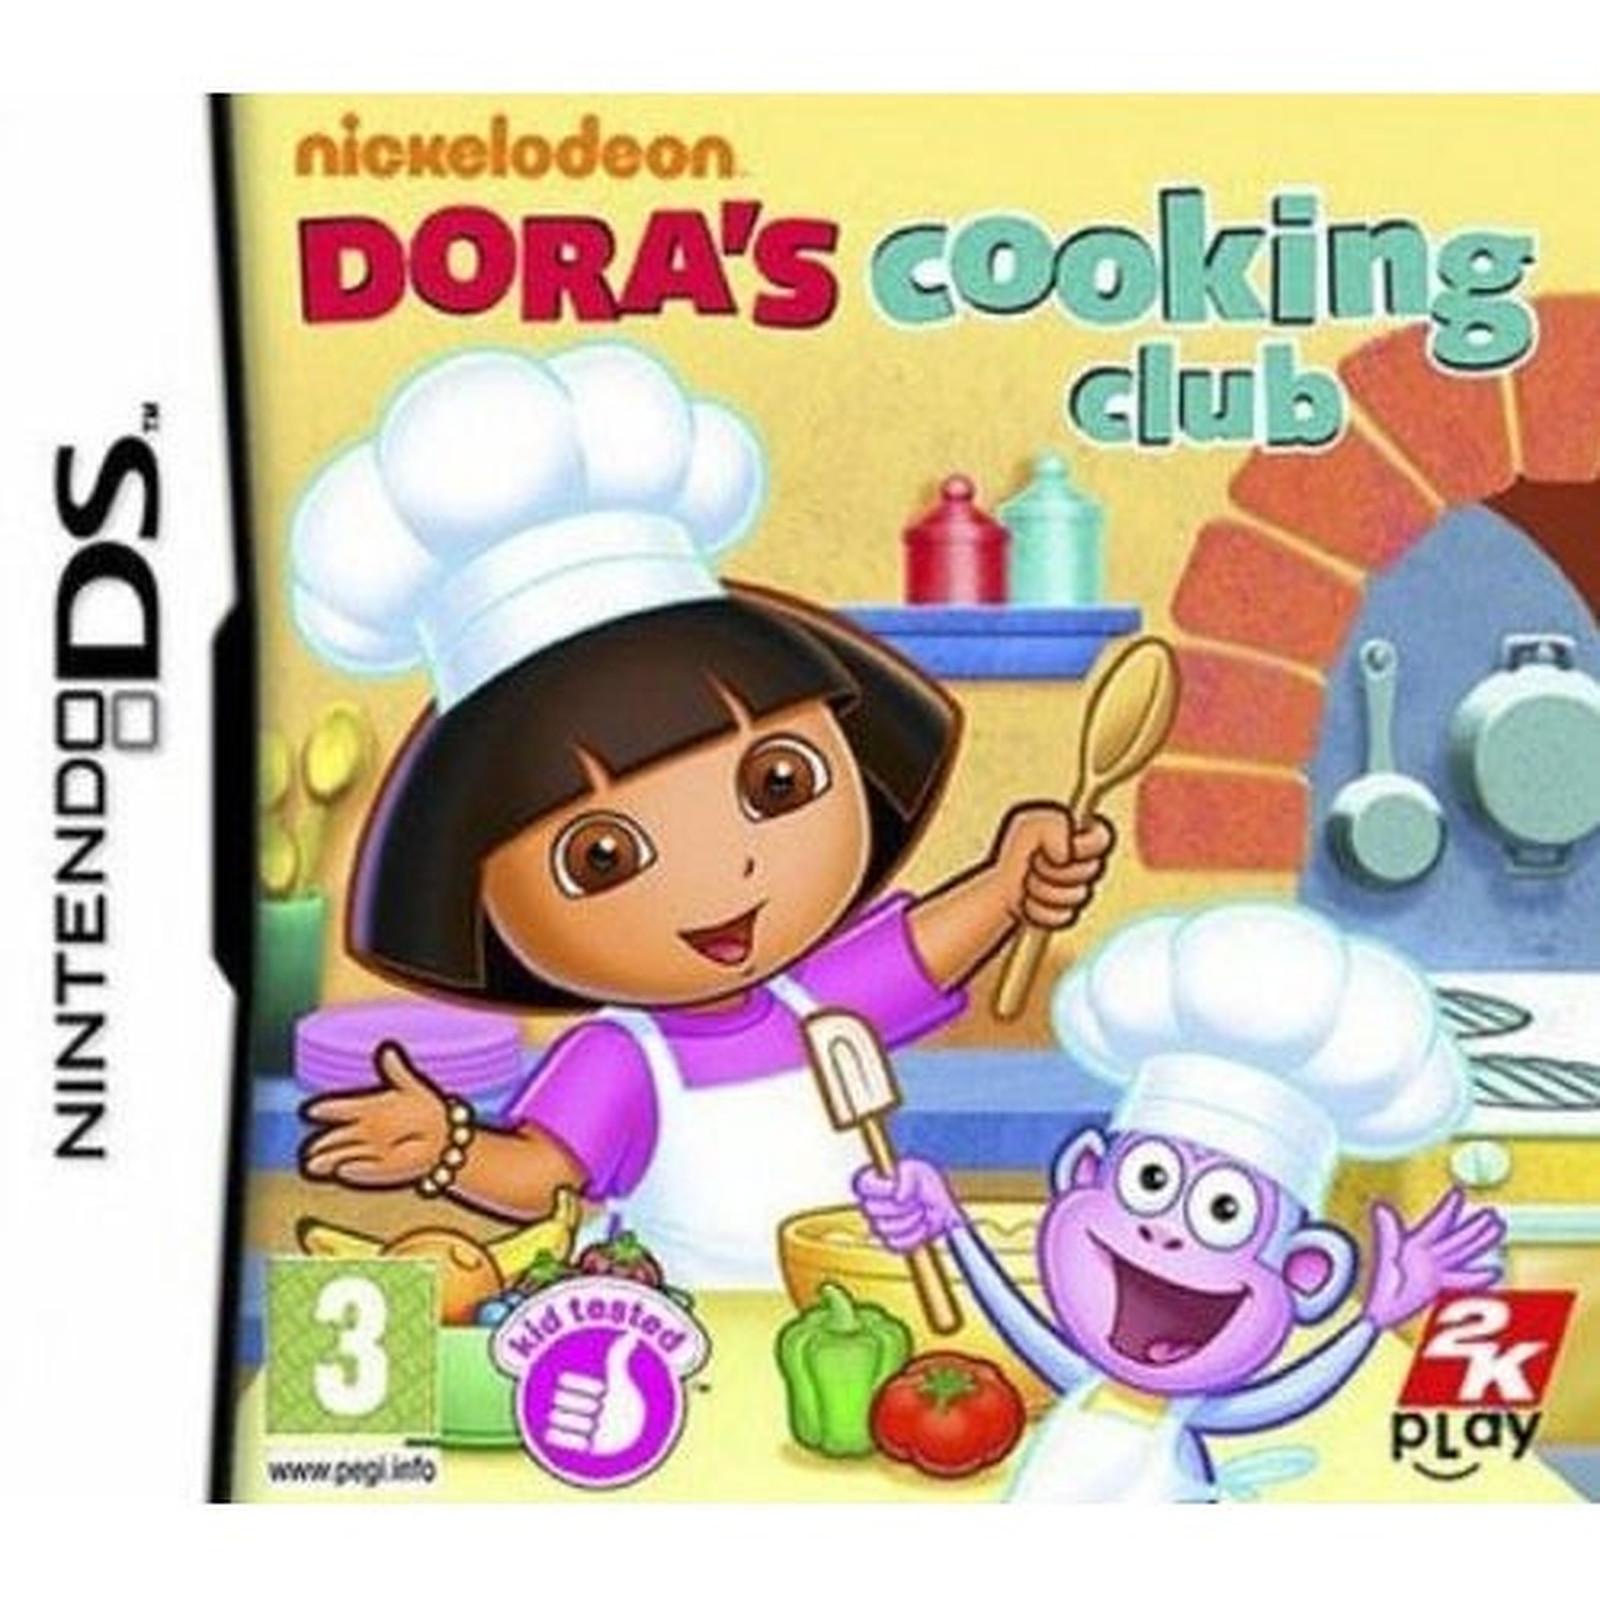 Dora's Cooking Club (Nintendo DS)